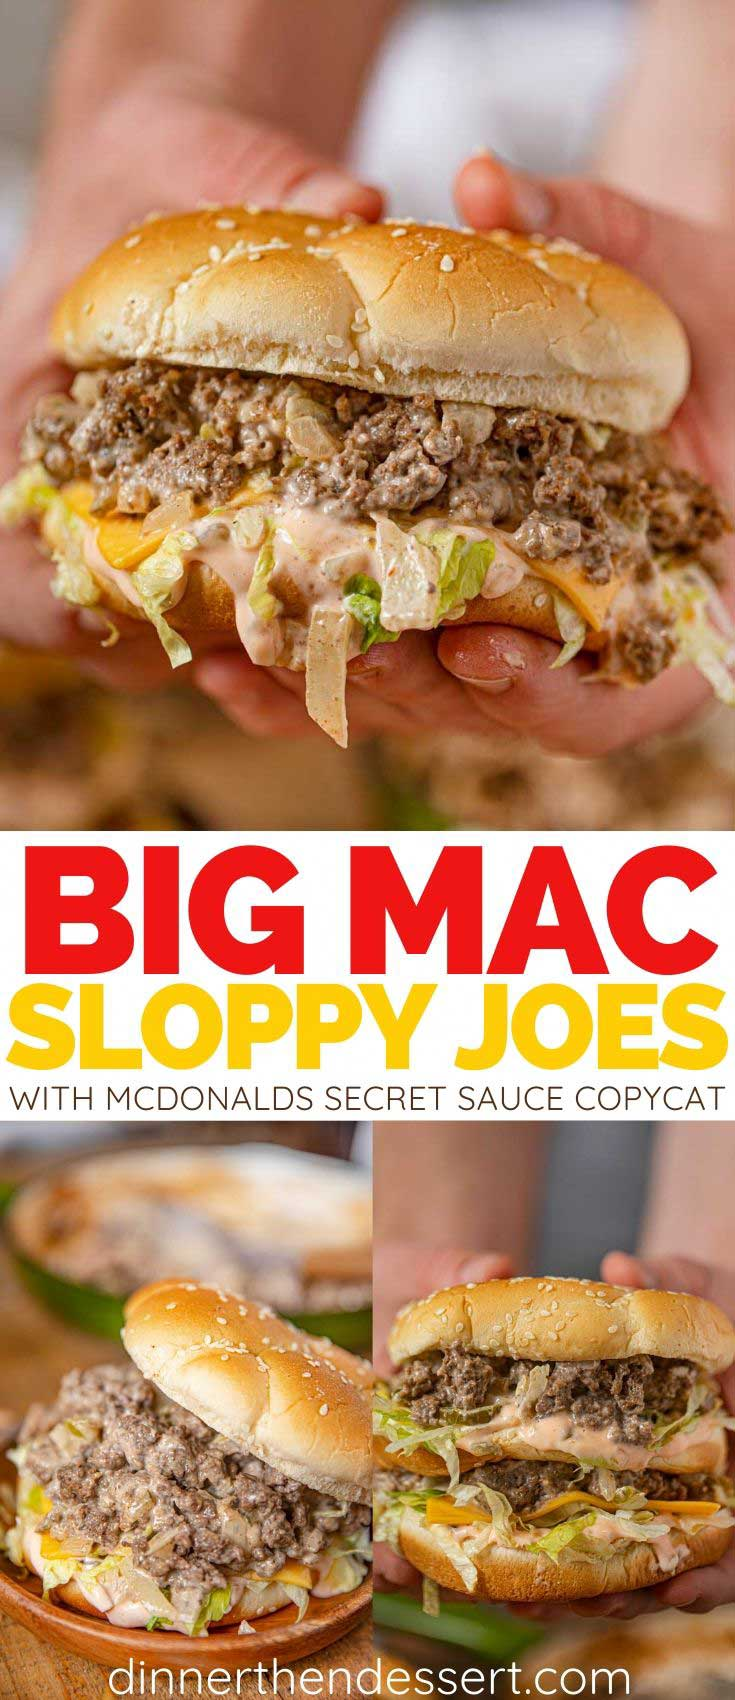 Big Mac Sloppy Joes (w/ Secret Sauce!) - Dinner, then Dessert